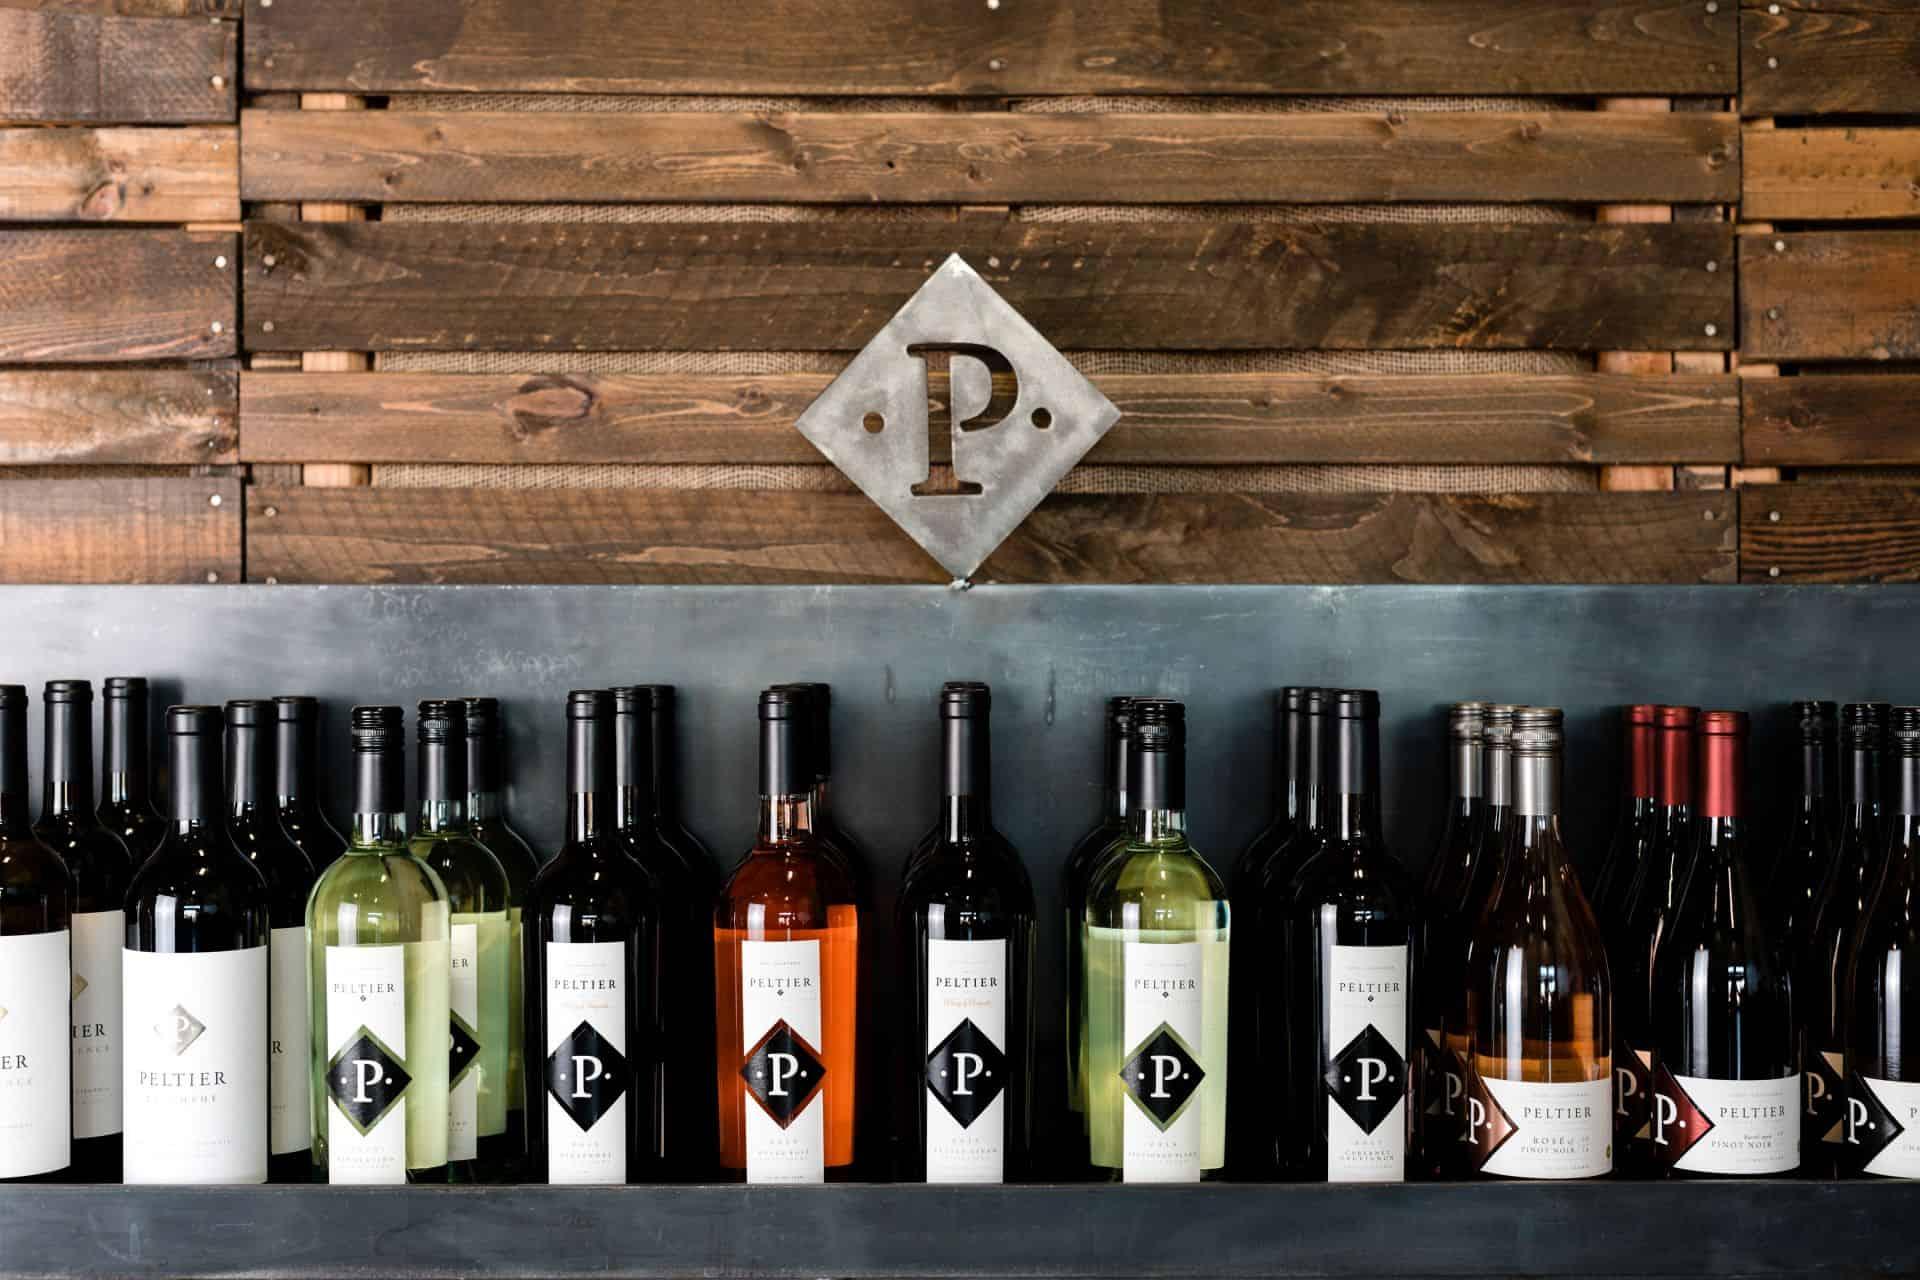 peltier wine bottles with wood background